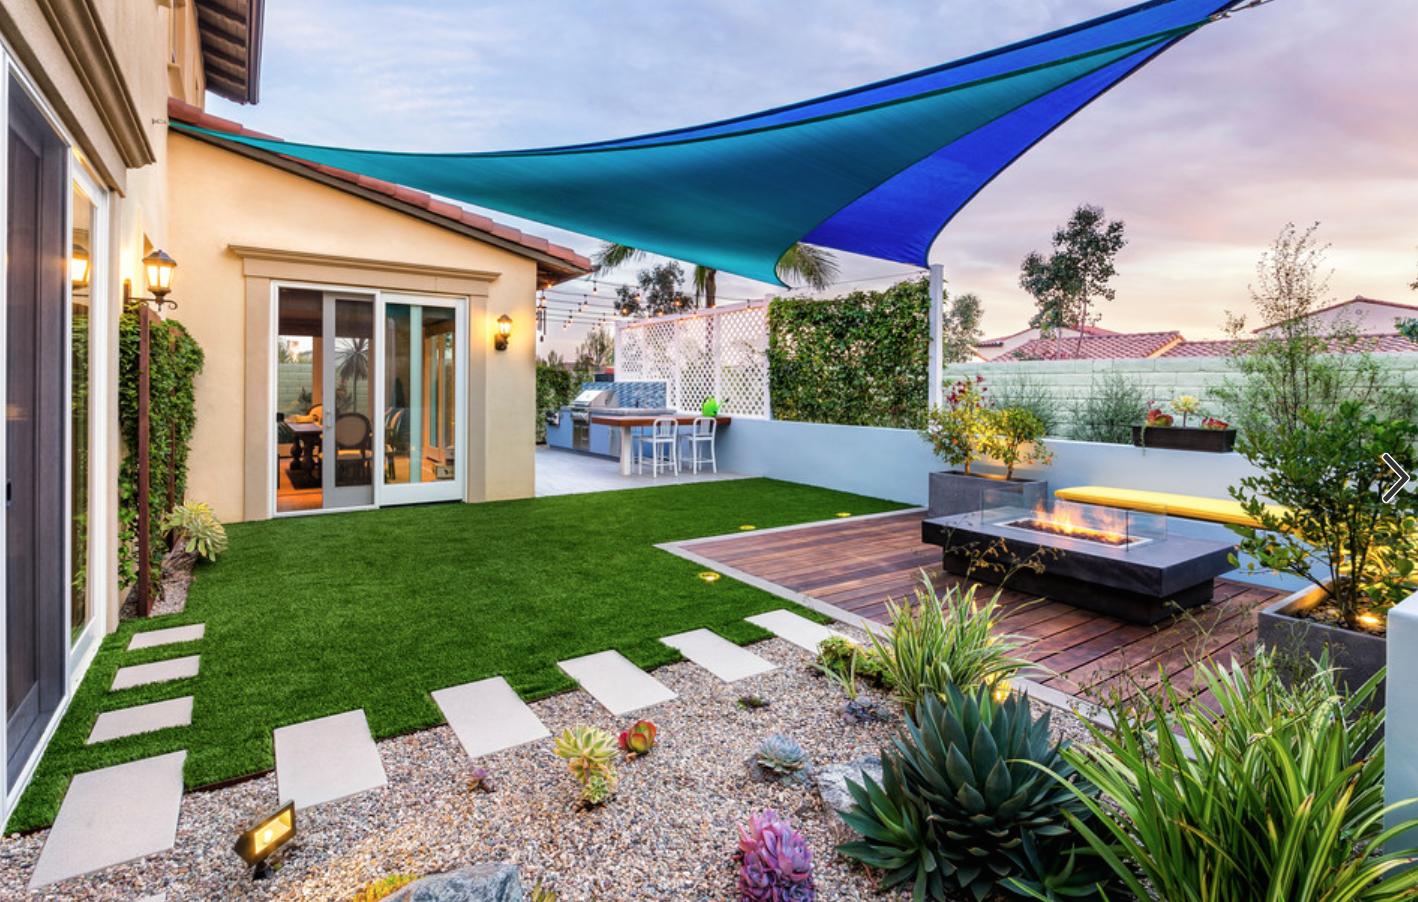 backyard inspo. Backyard inspo, Backyard, Ipe wood deck